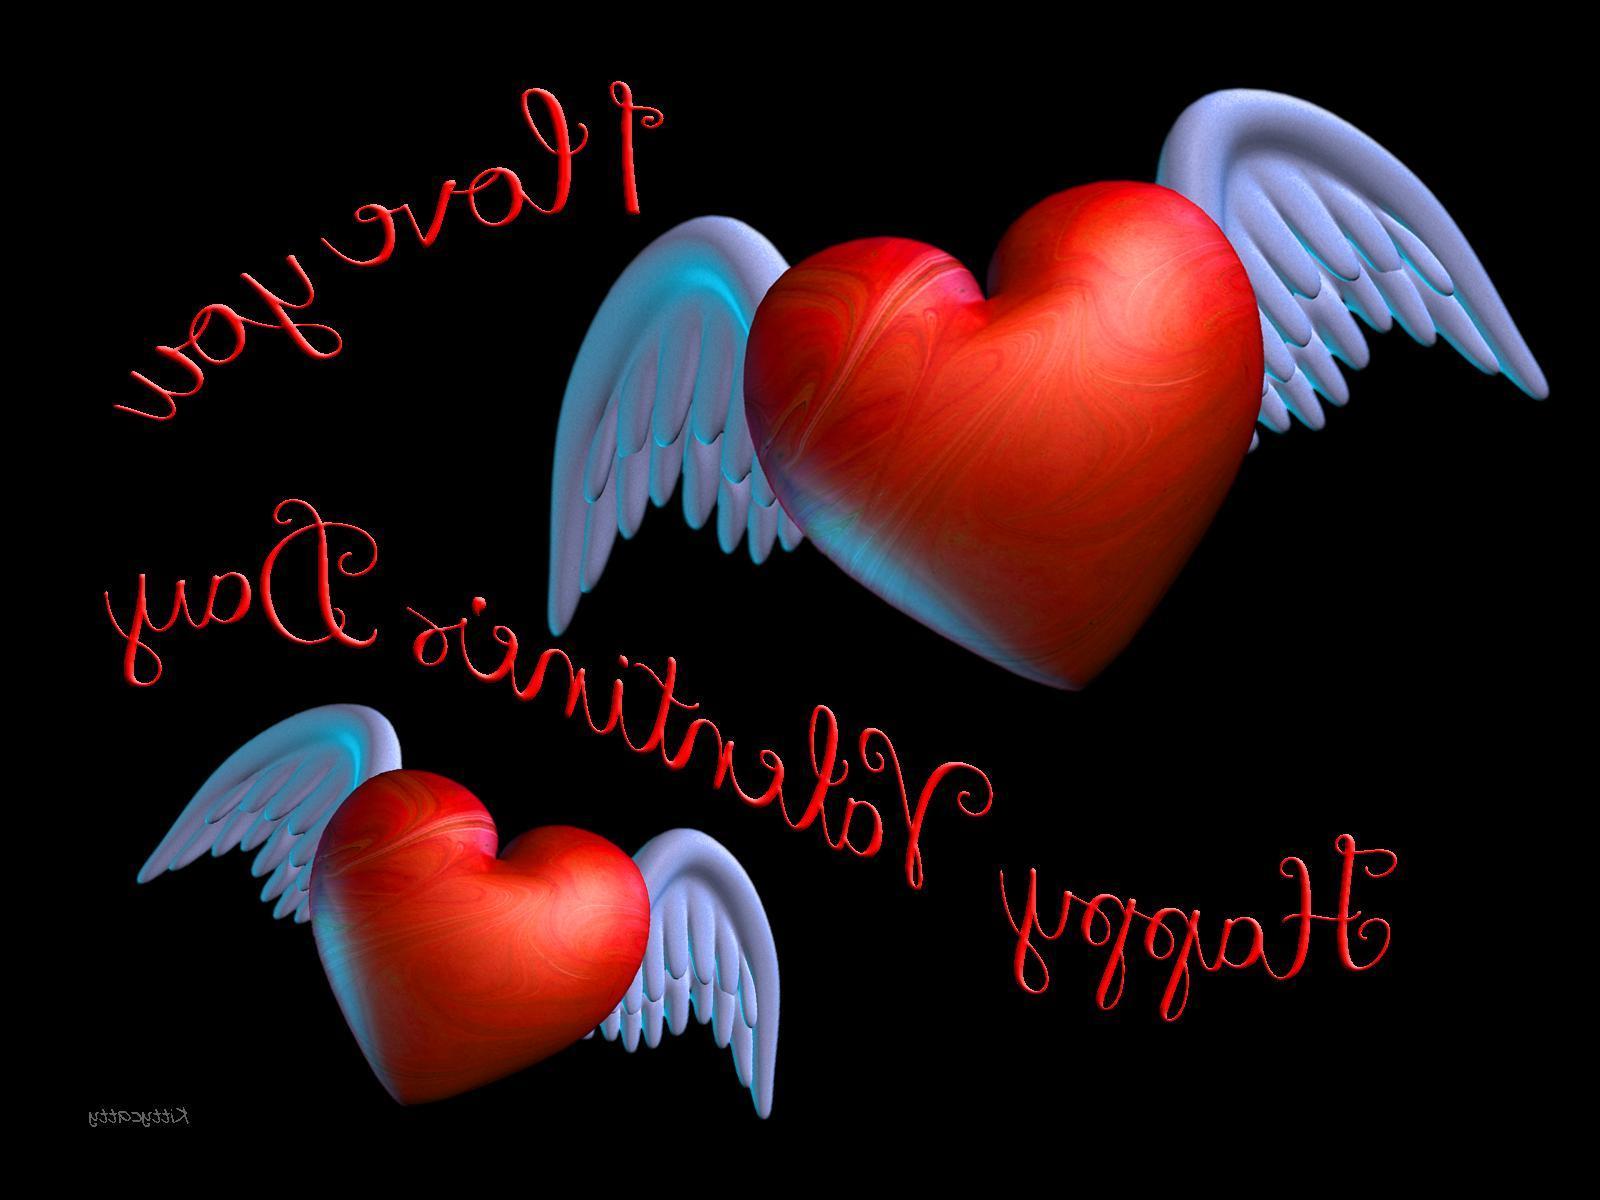 Love heart wallpapers 2016 wallpaper cave - Heart to heart wallpaper ...